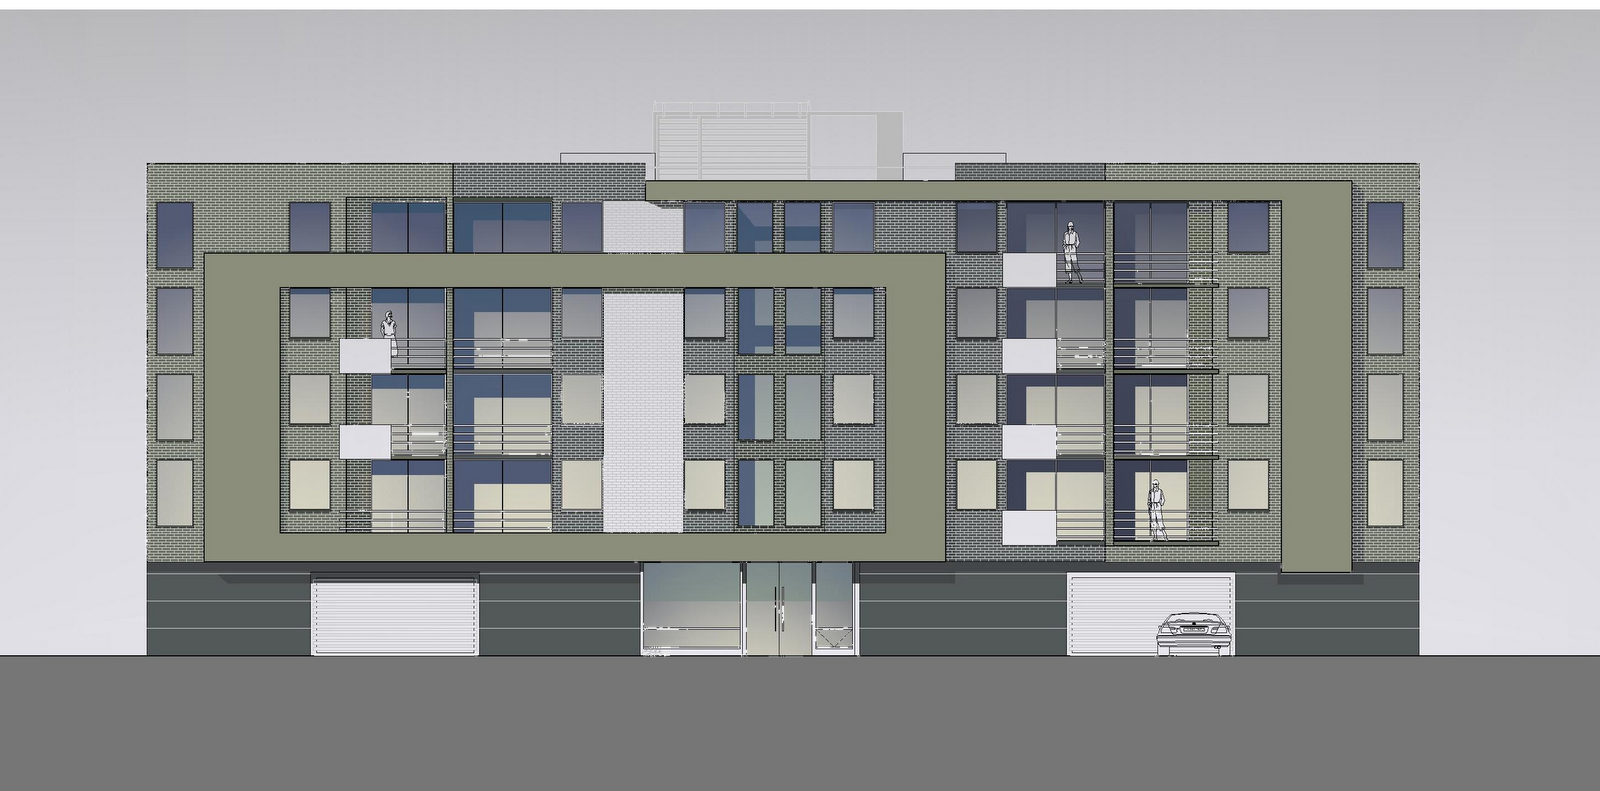 Fredy forero arquitecto arquitectura residencial - Alzado arquitectura ...